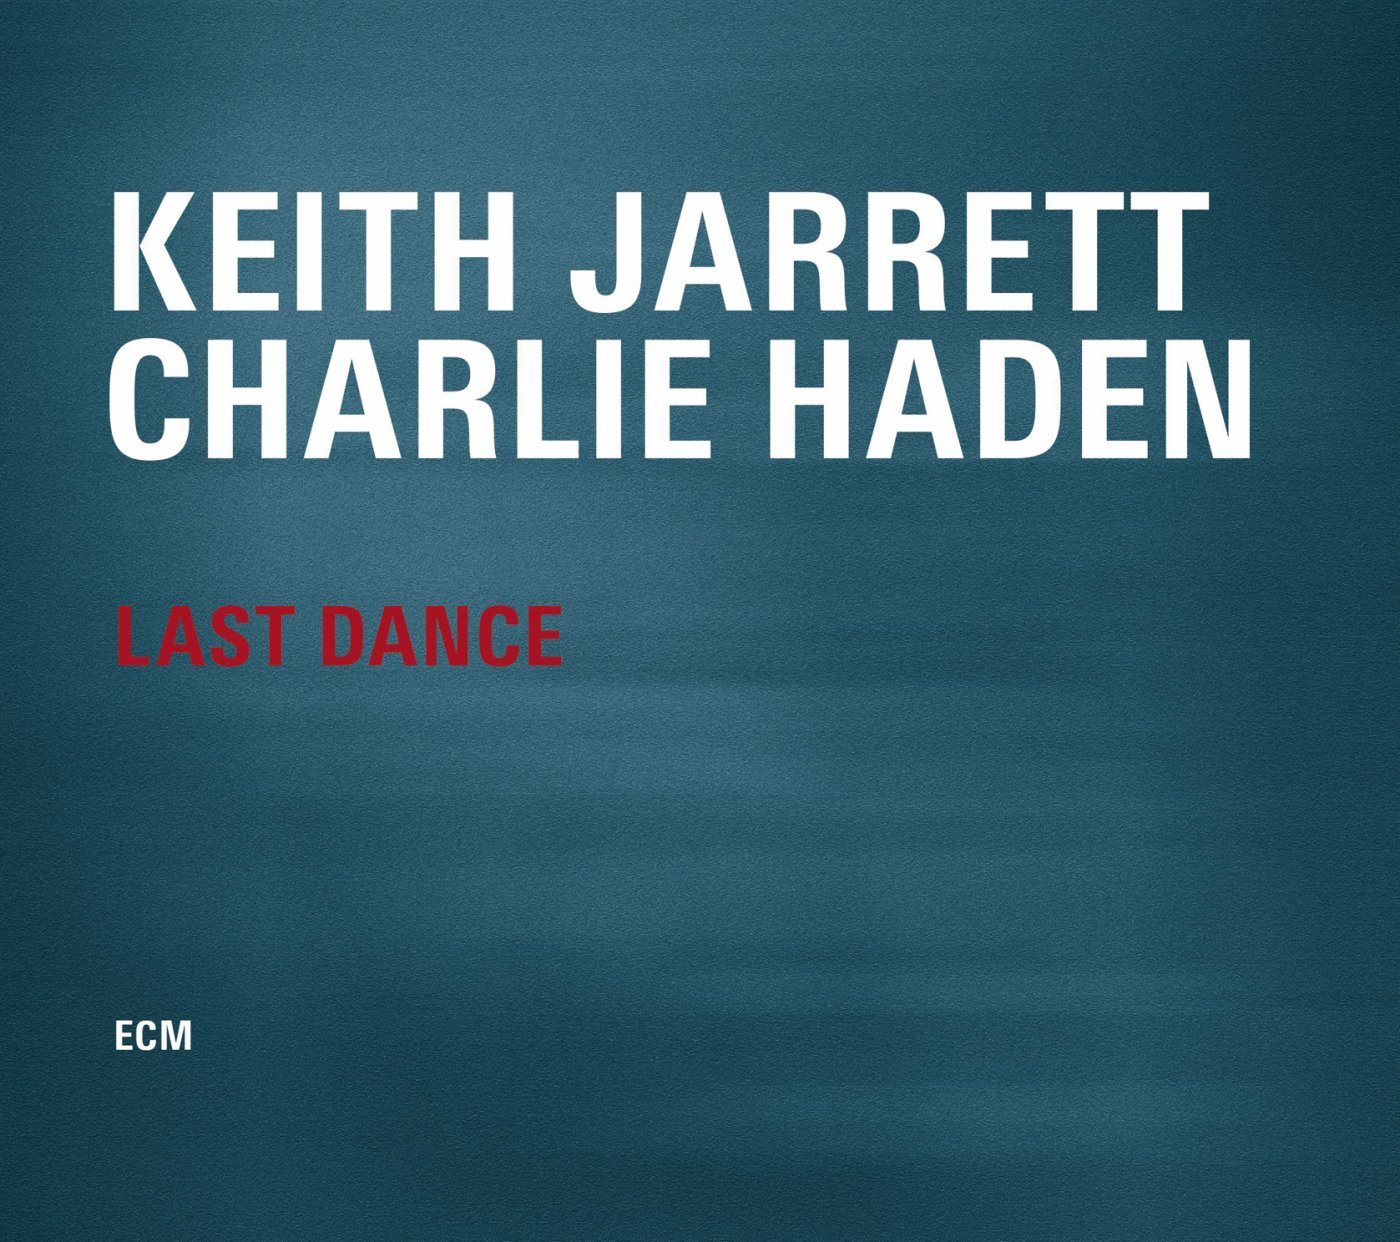 Keith Jarrett And Charlie Haden – Last Dance (2014) [FLAC]